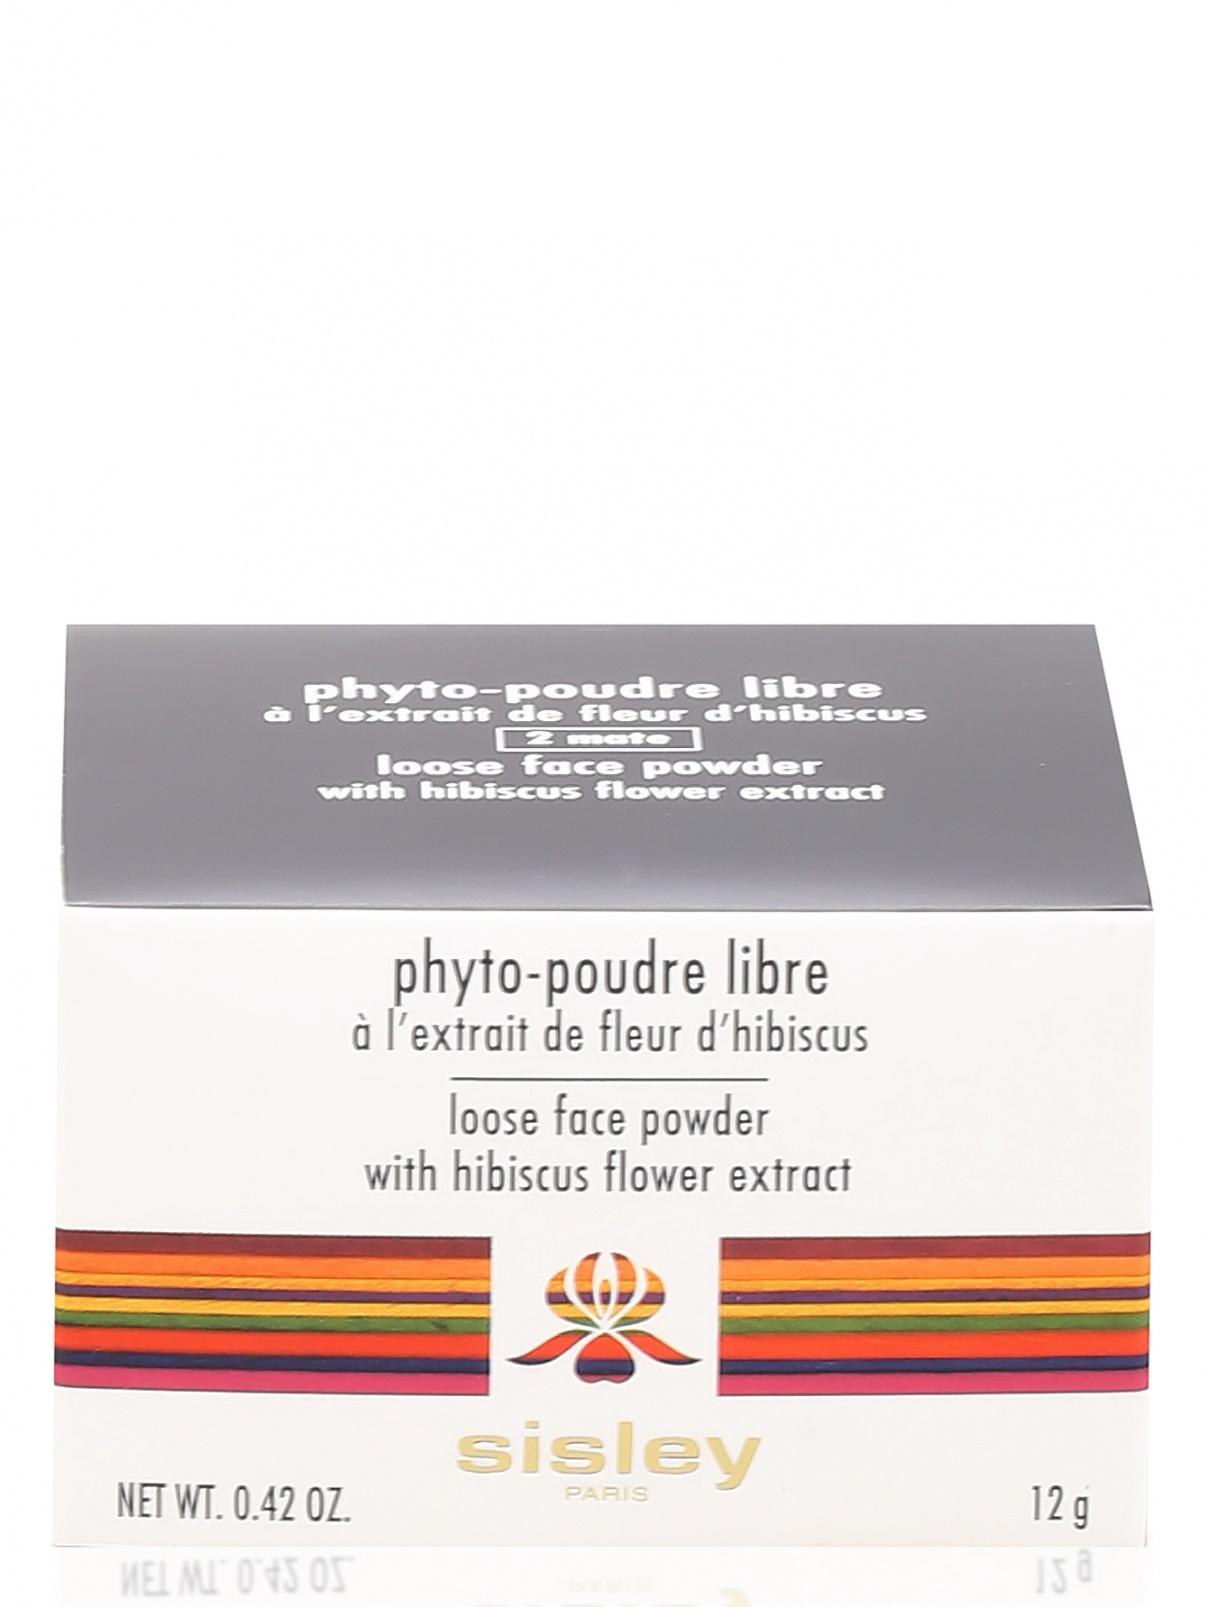 Пудра - №2 mate, Phyto- poudre libre Sisley  –  Модель Общий вид